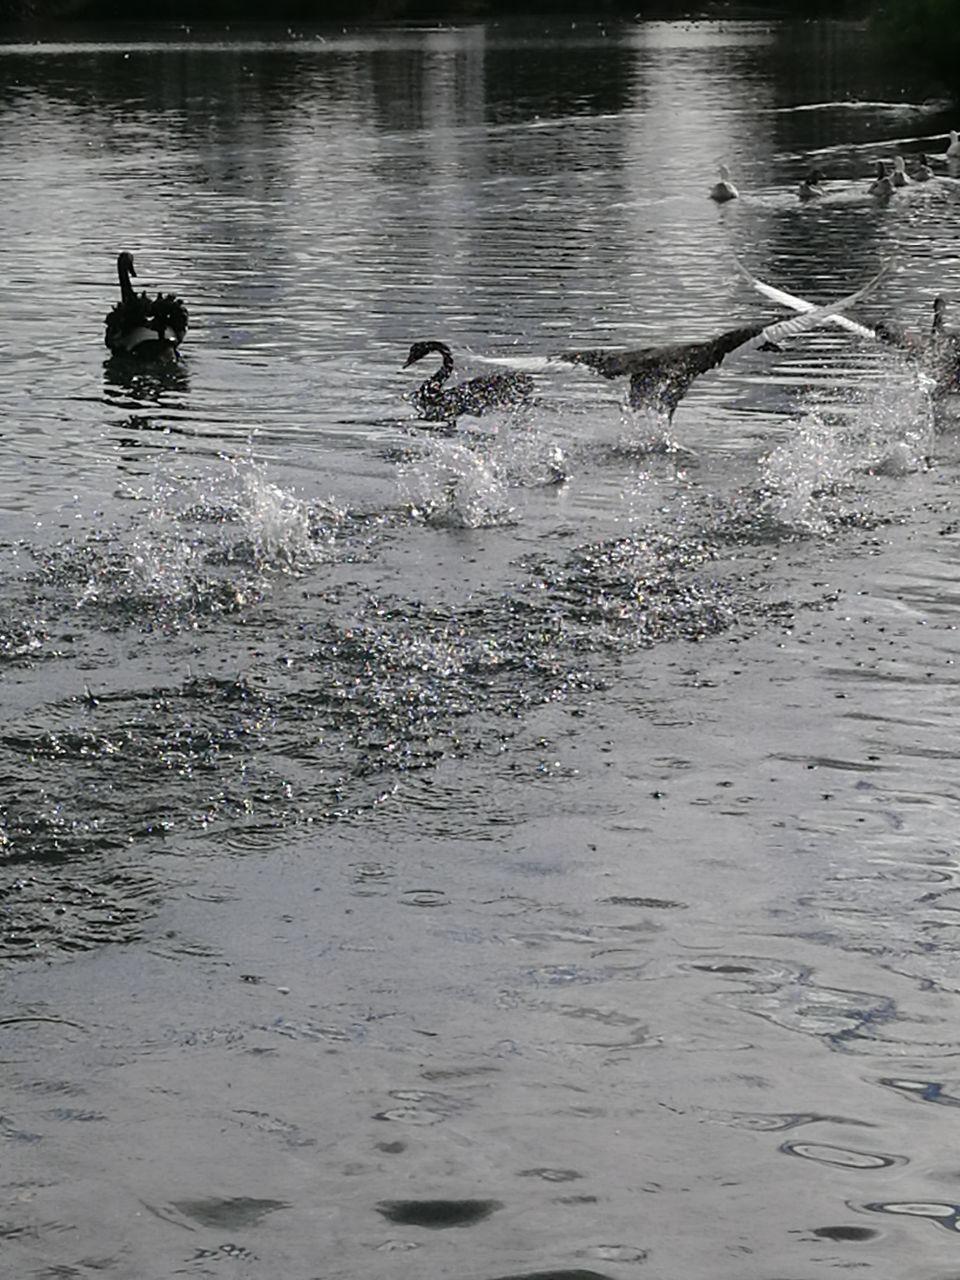 water, animal, animal themes, animals in the wild, group of animals, animal wildlife, vertebrate, waterfront, bird, swimming, day, nature, motion, lake, outdoors, no people, splashing, mammal, rippled, duck